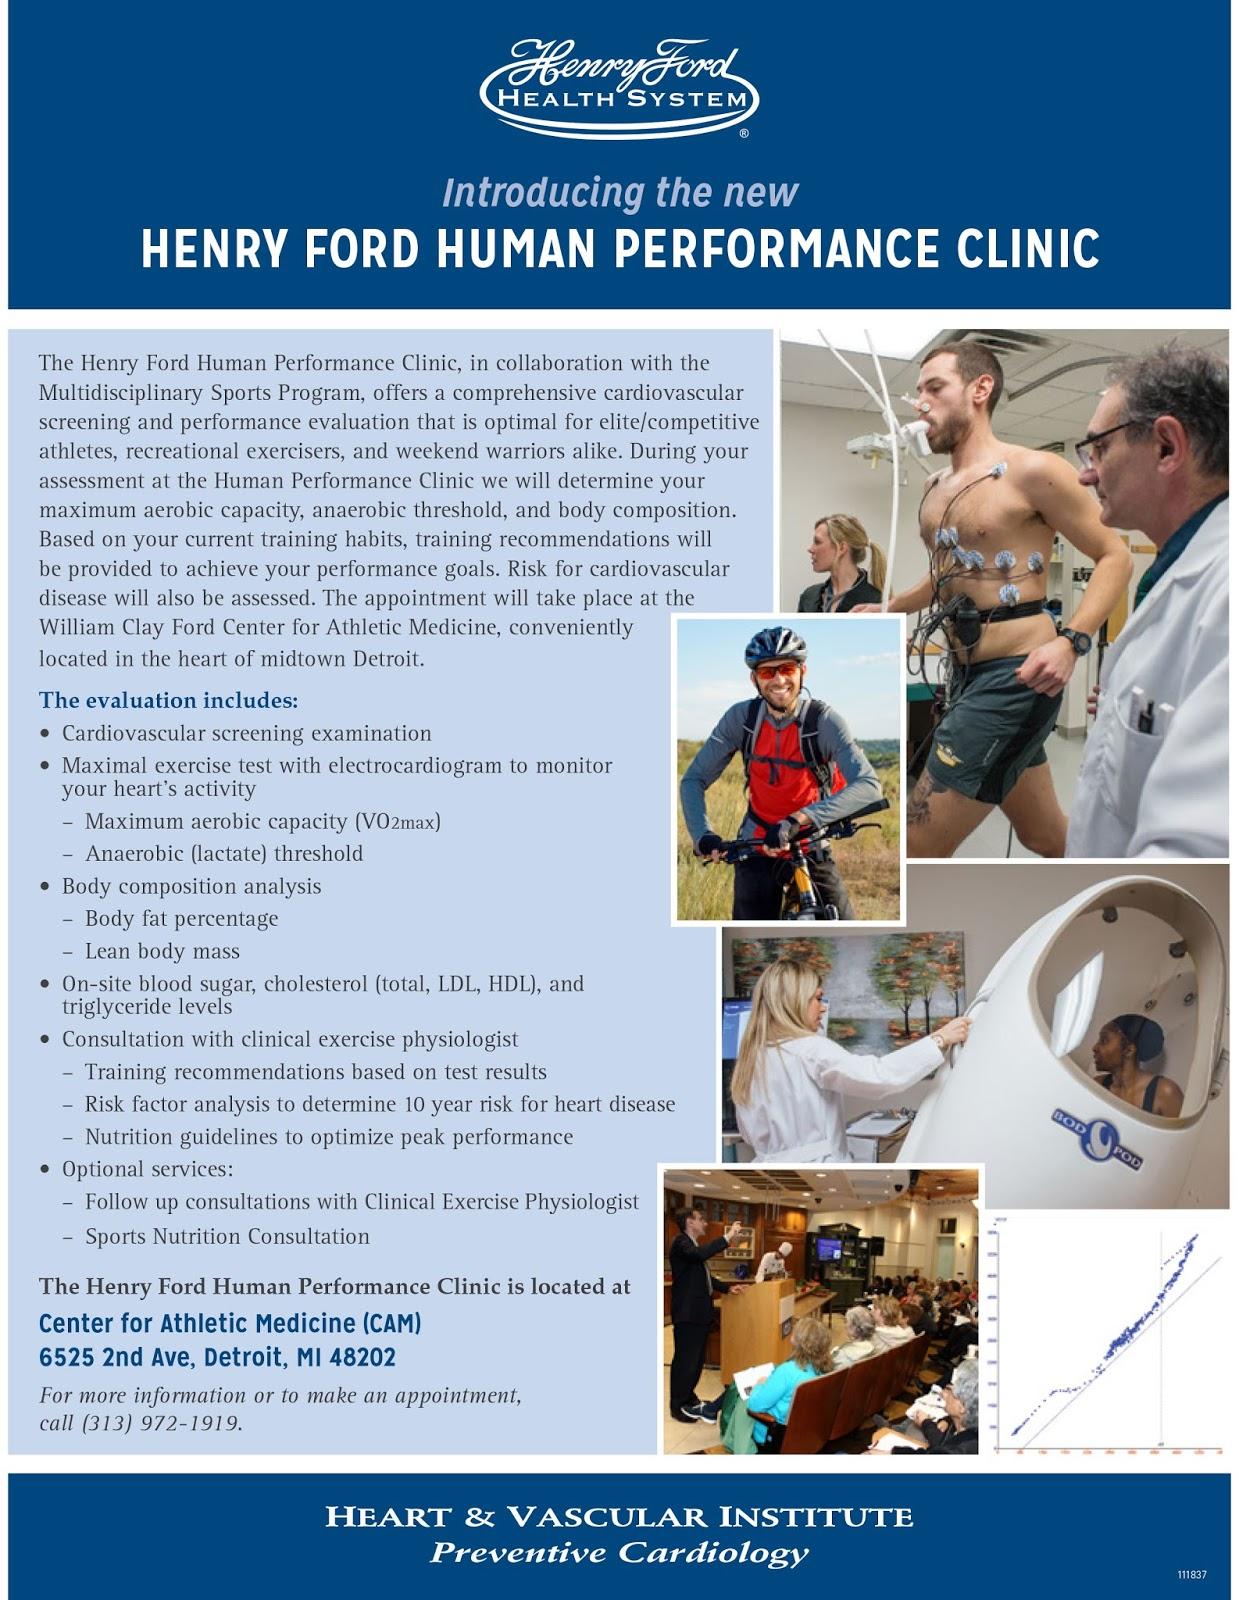 Vegan Road Runner: Henry Ford Human Performance Clinic